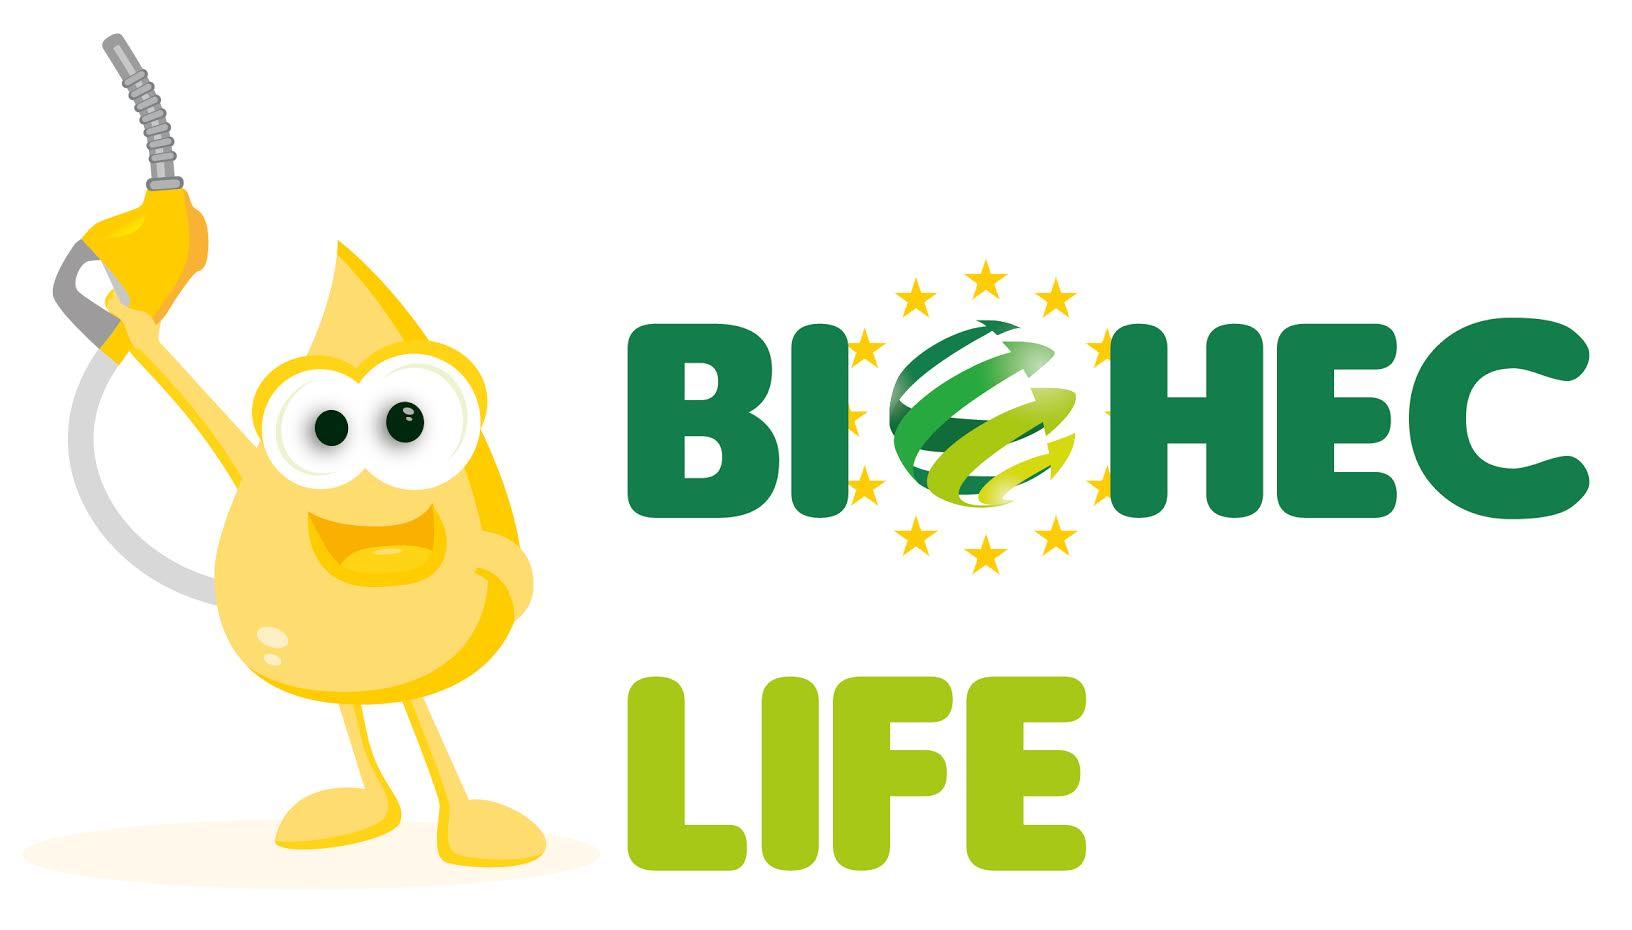 Biohec logo